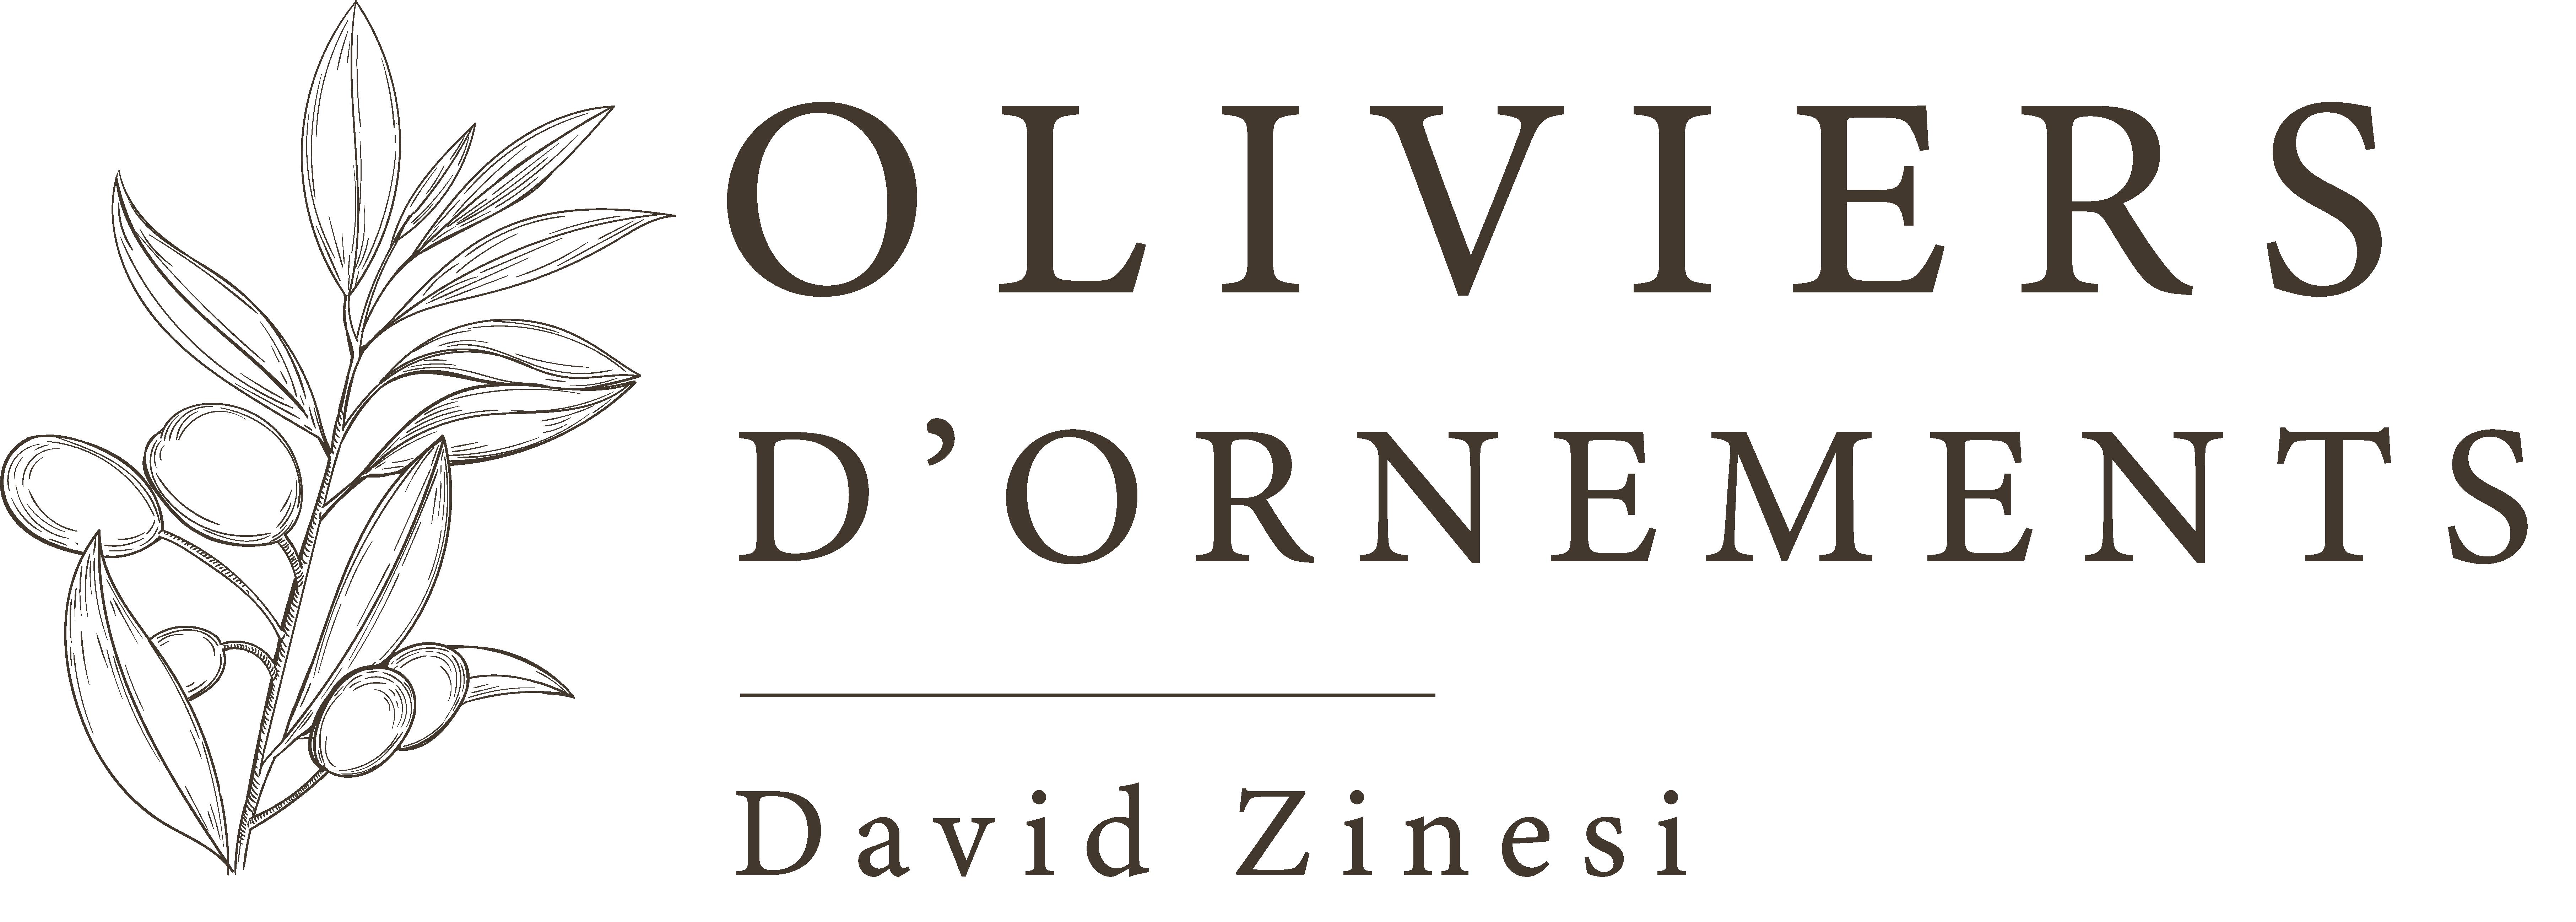 Olivier Ornement